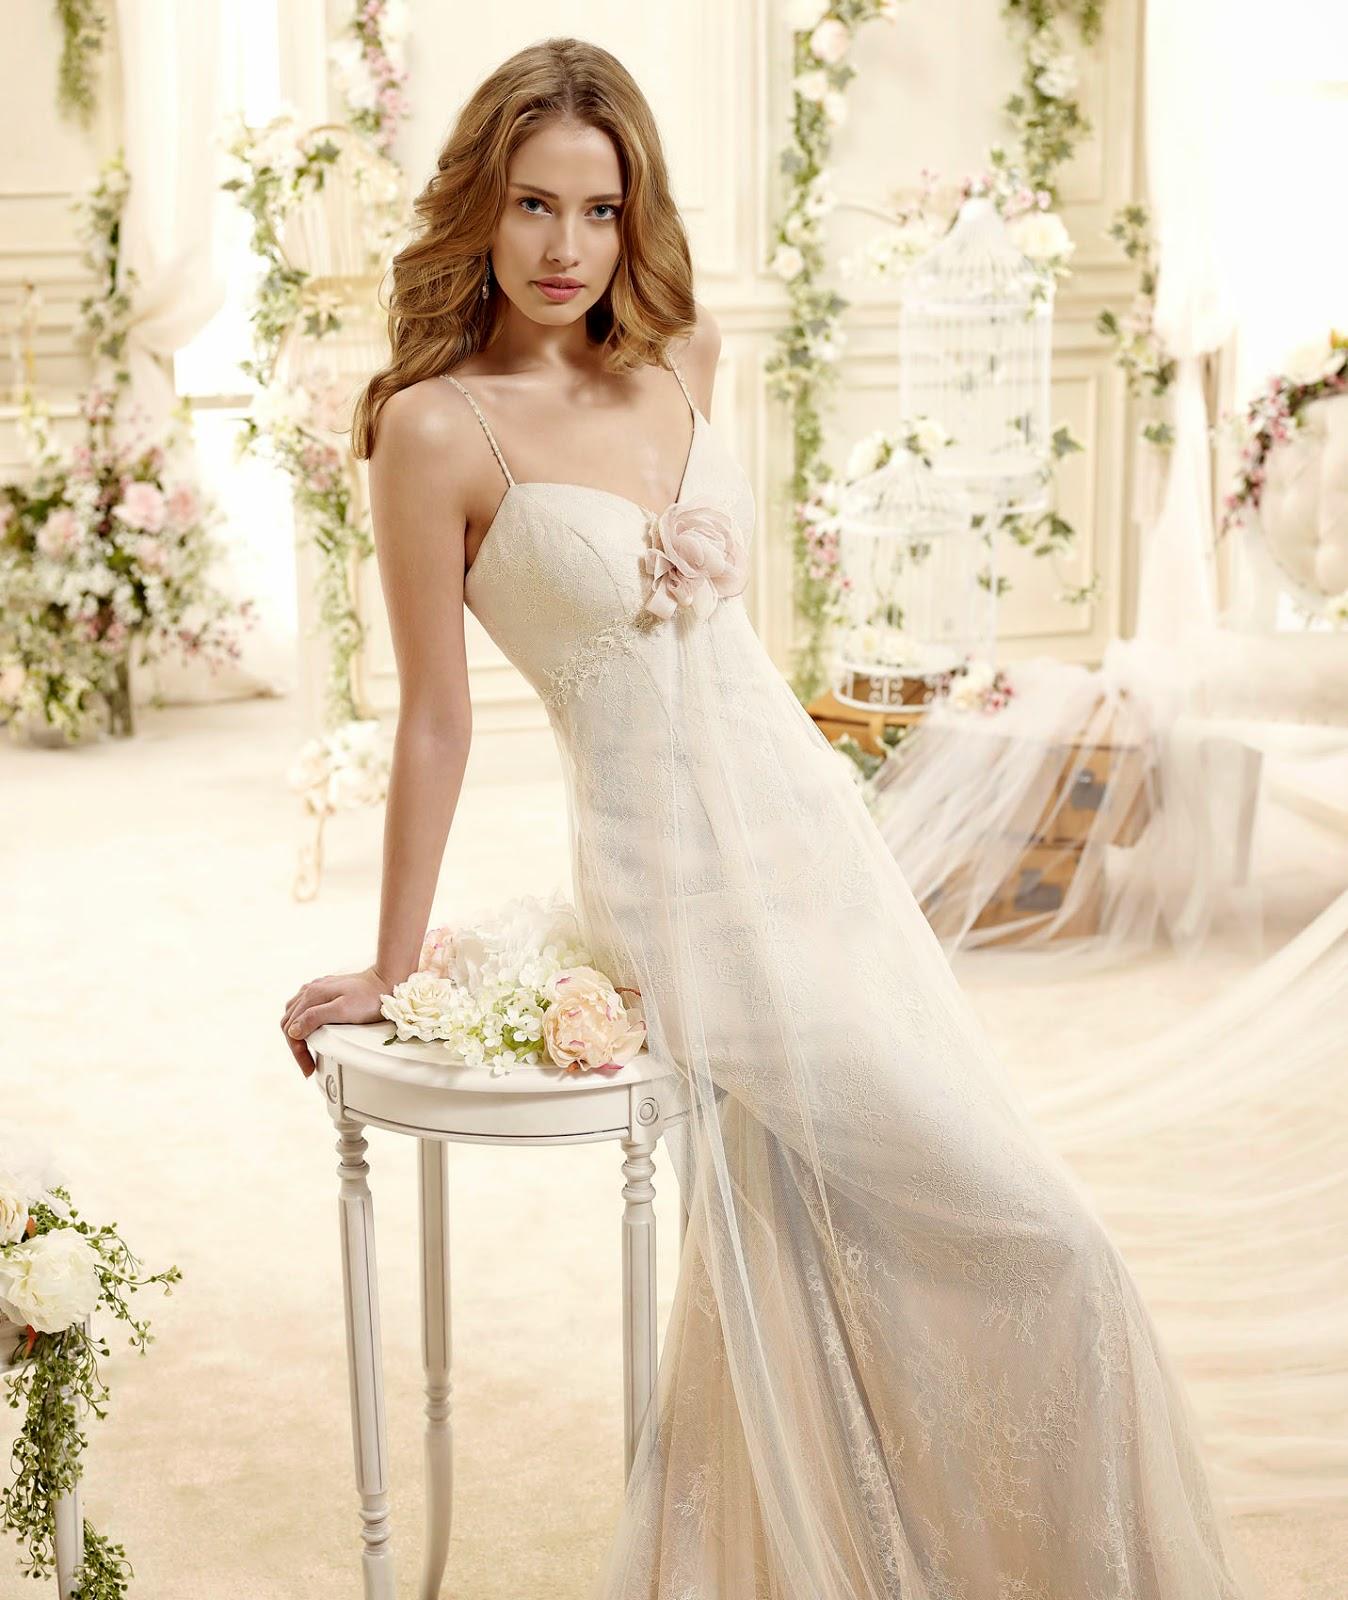 Super Tendenze abiti da sposa 2015 - Moda nozze - Forum Matrimonio.com KT76